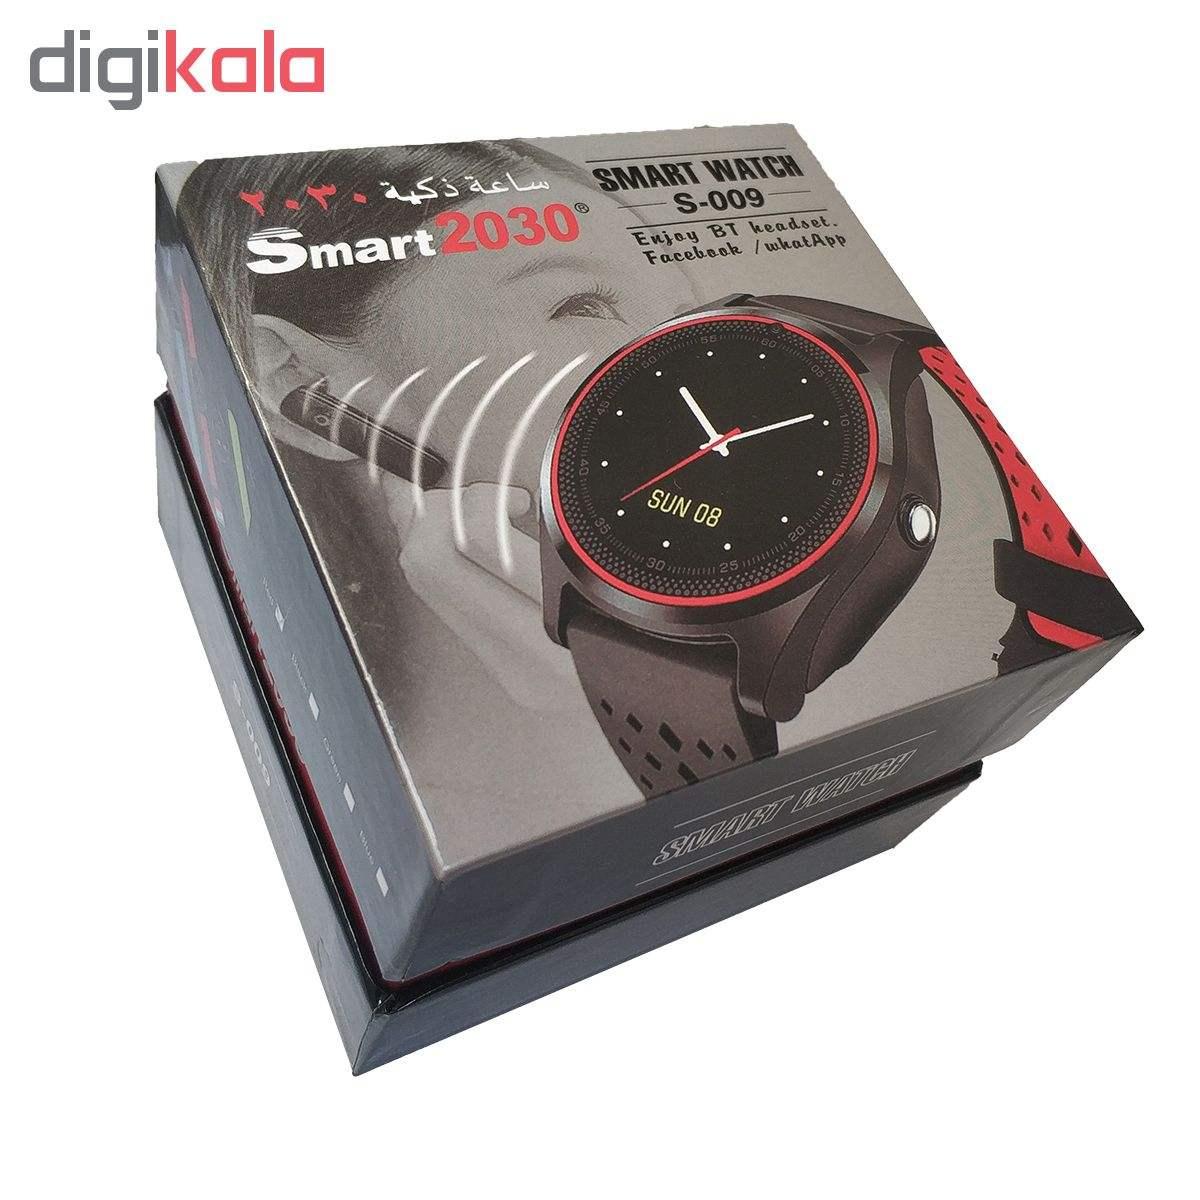 ساعت هوشمند اسمارت 2030 مدل S-009 main 1 4